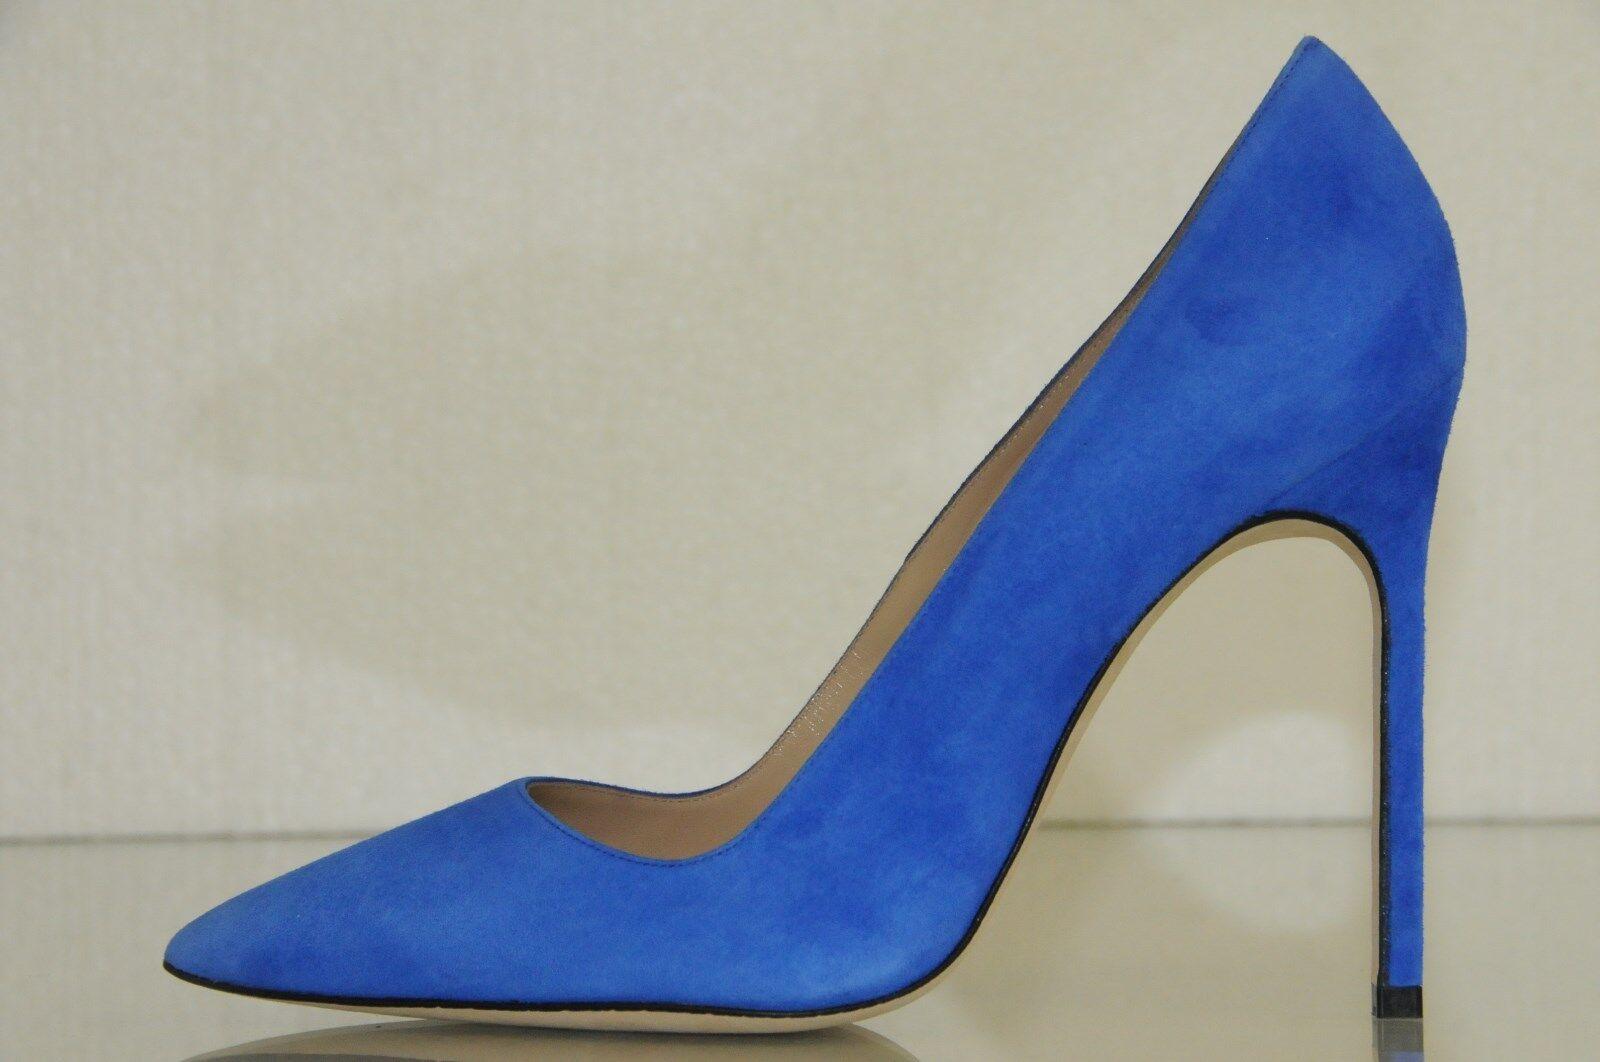 New Manolo Blahnik BB BB BB 115 Cobalt bluee Suede shoes Heels Pumps 35 39 40.5 Wedding 3ae0f7